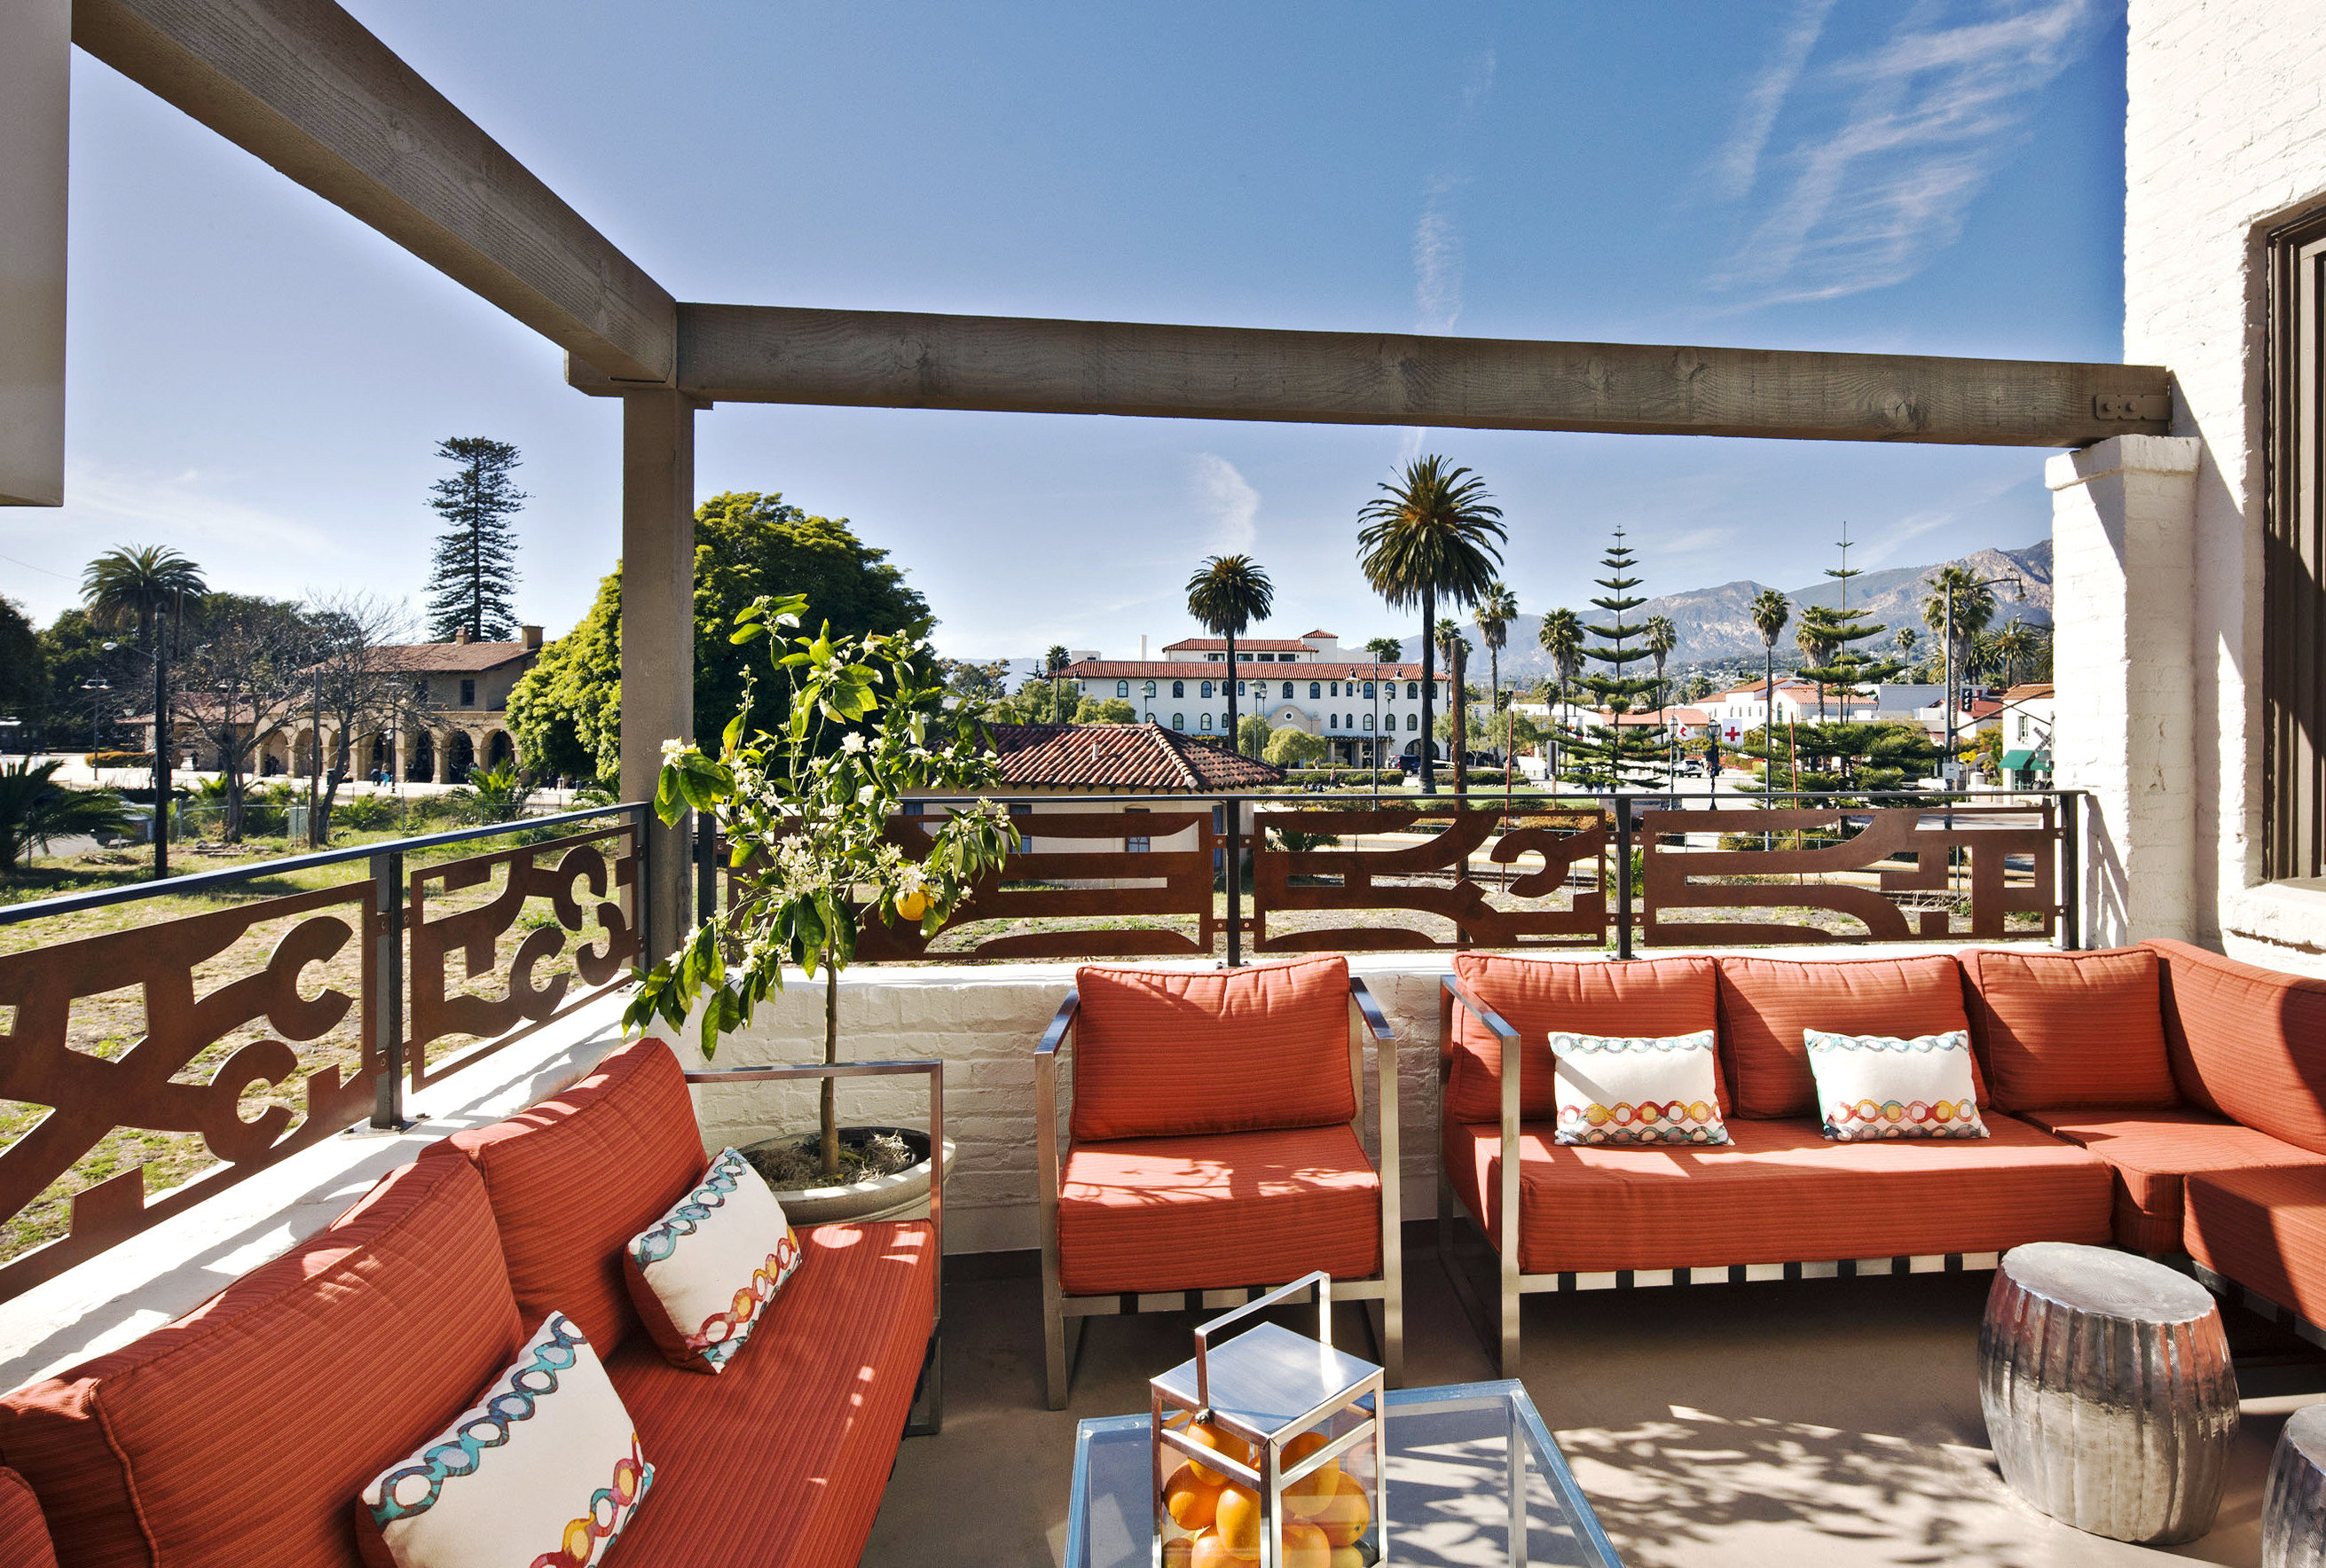 Hotels In Santa Barbara >> Hotel Indigo Santa Barbara Santa Barbara Ca Jetsetter